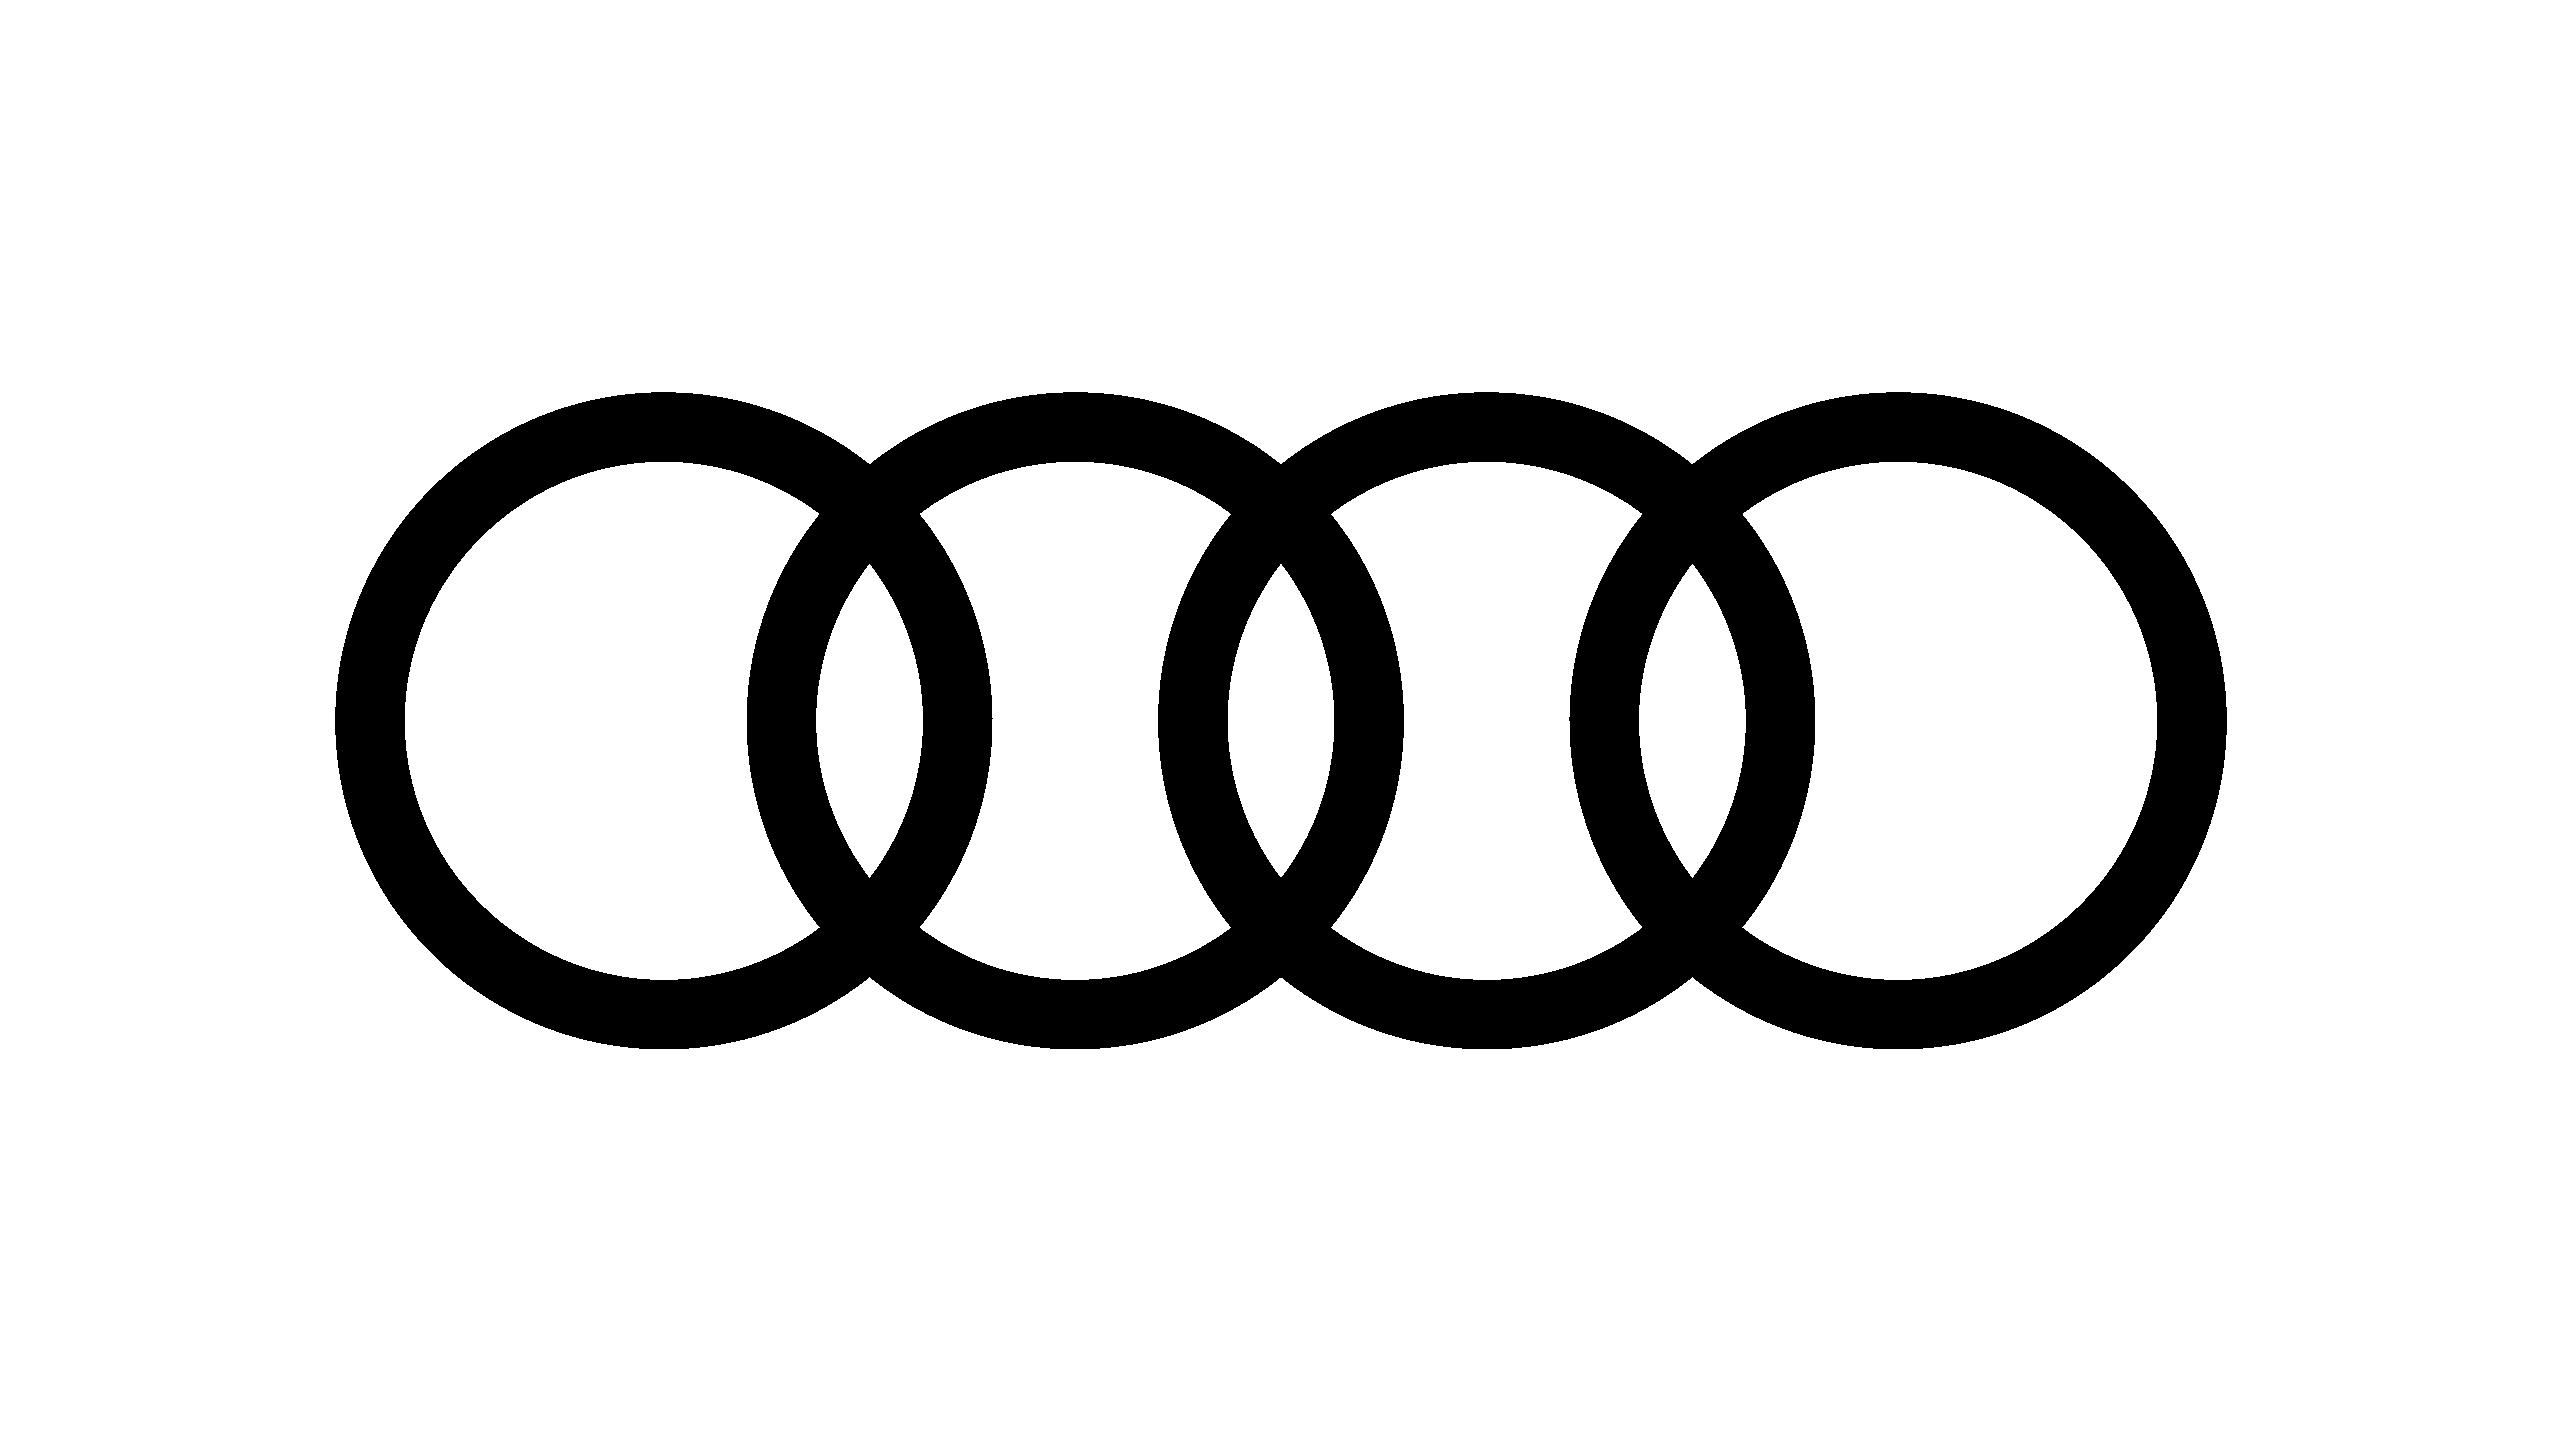 image audi logo png forza motorsport wiki fandom powered by wikia rh forza wikia com audi logo png download audi logo png hd